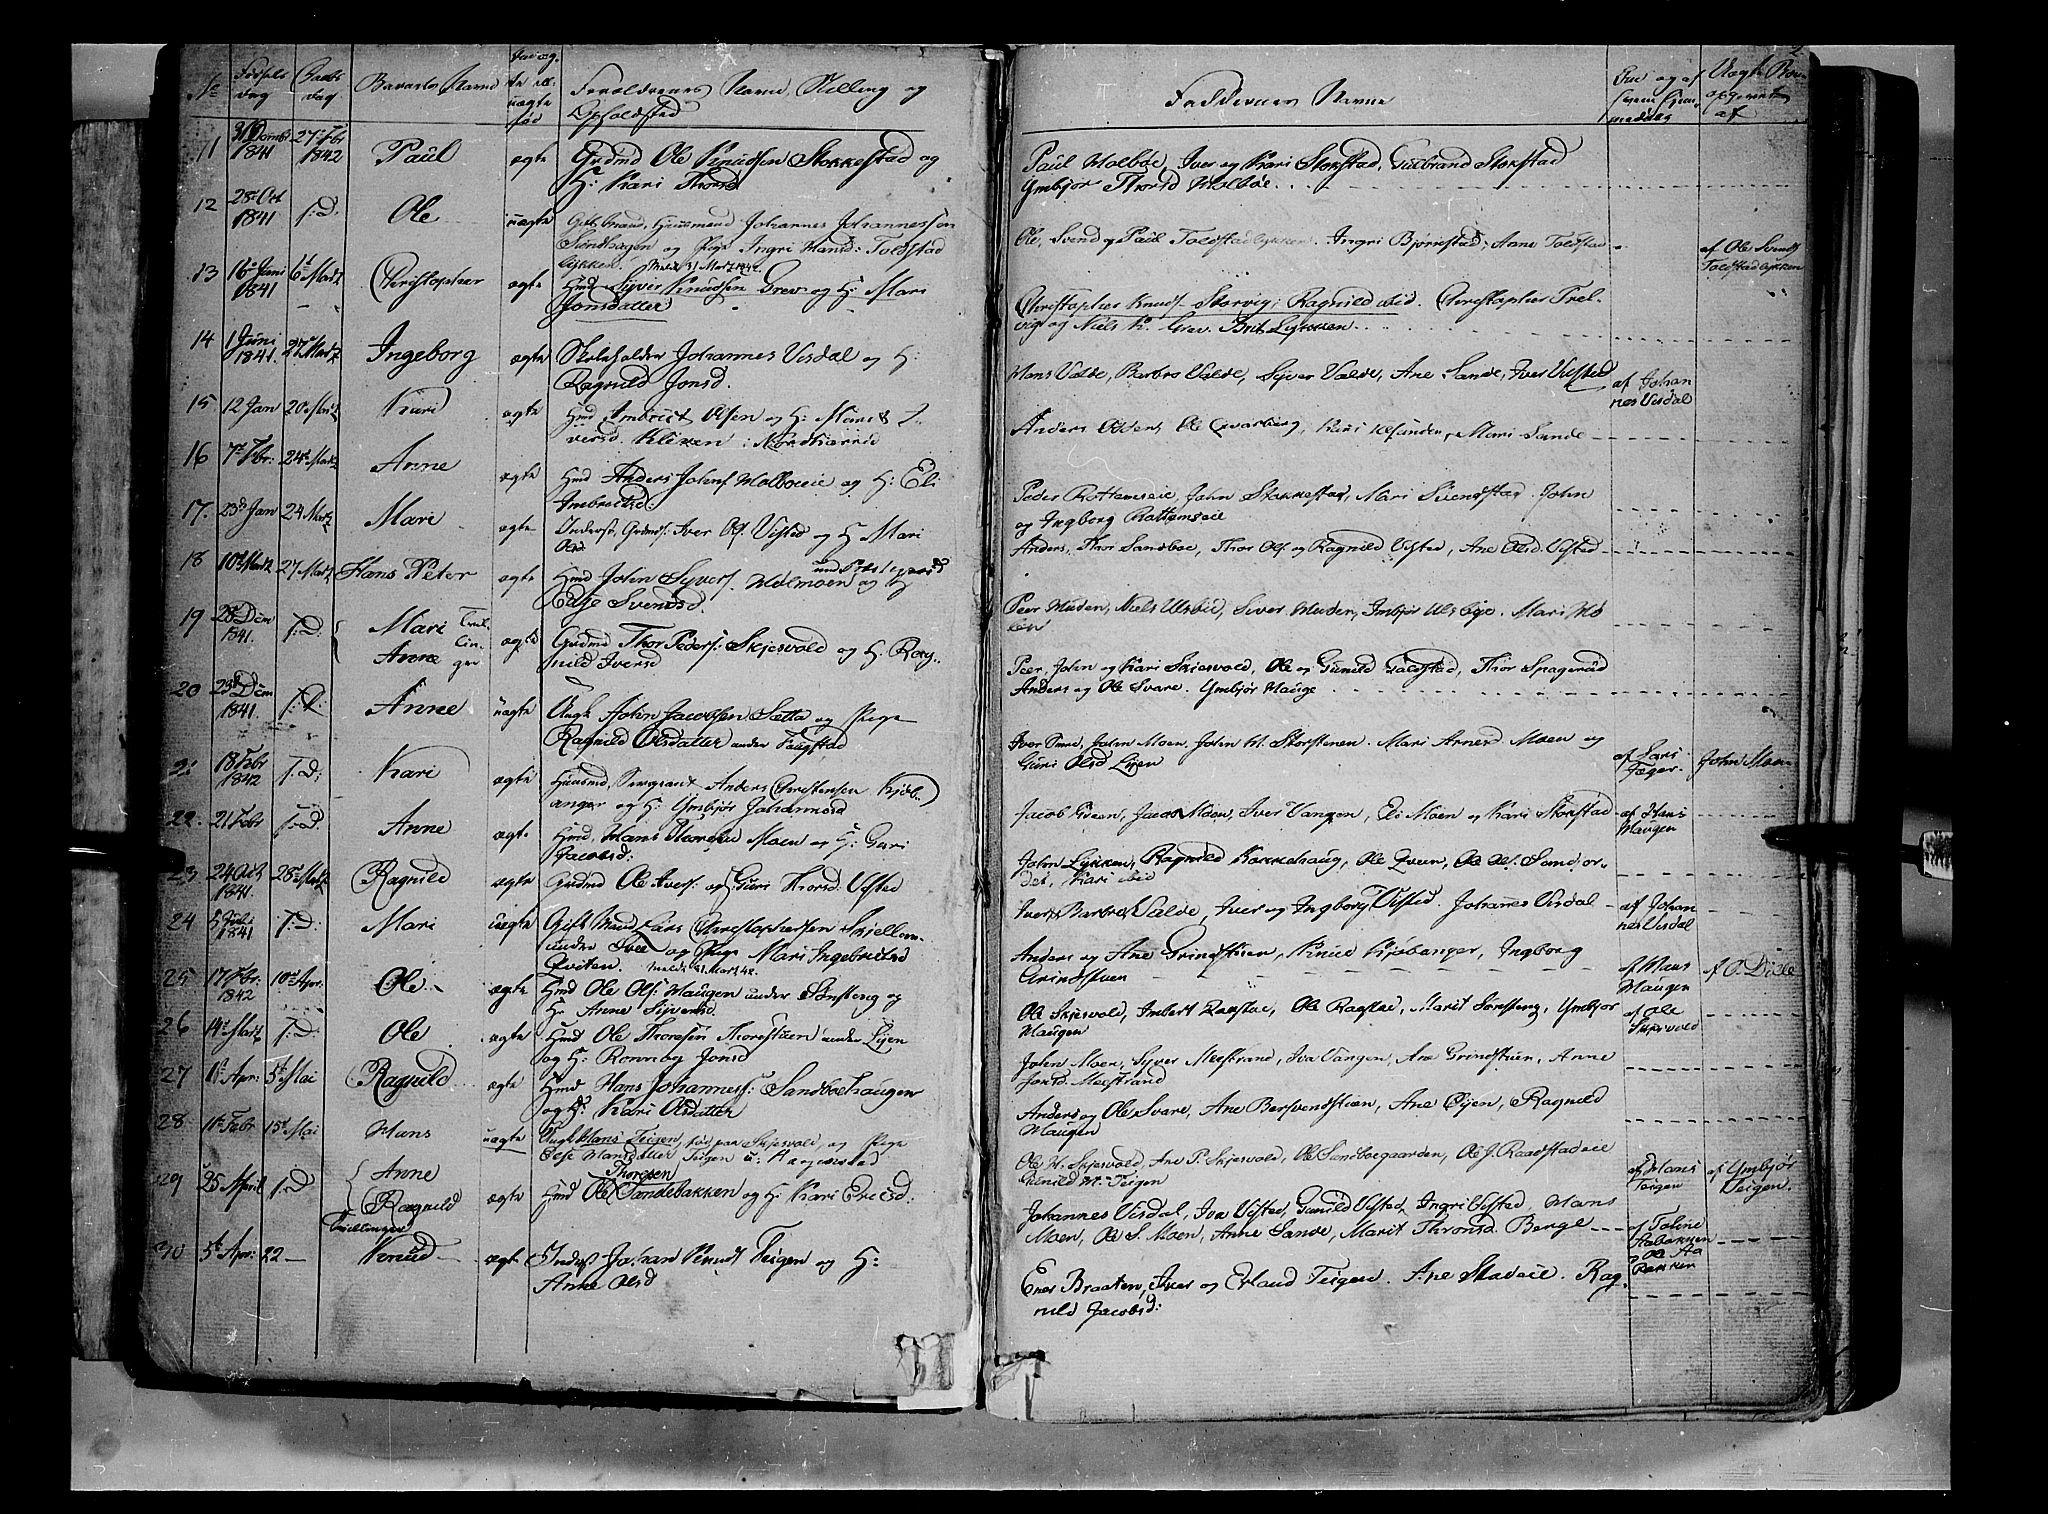 SAH, Vågå prestekontor, Ministerialbok nr. 5 /1, 1842-1856, s. 2